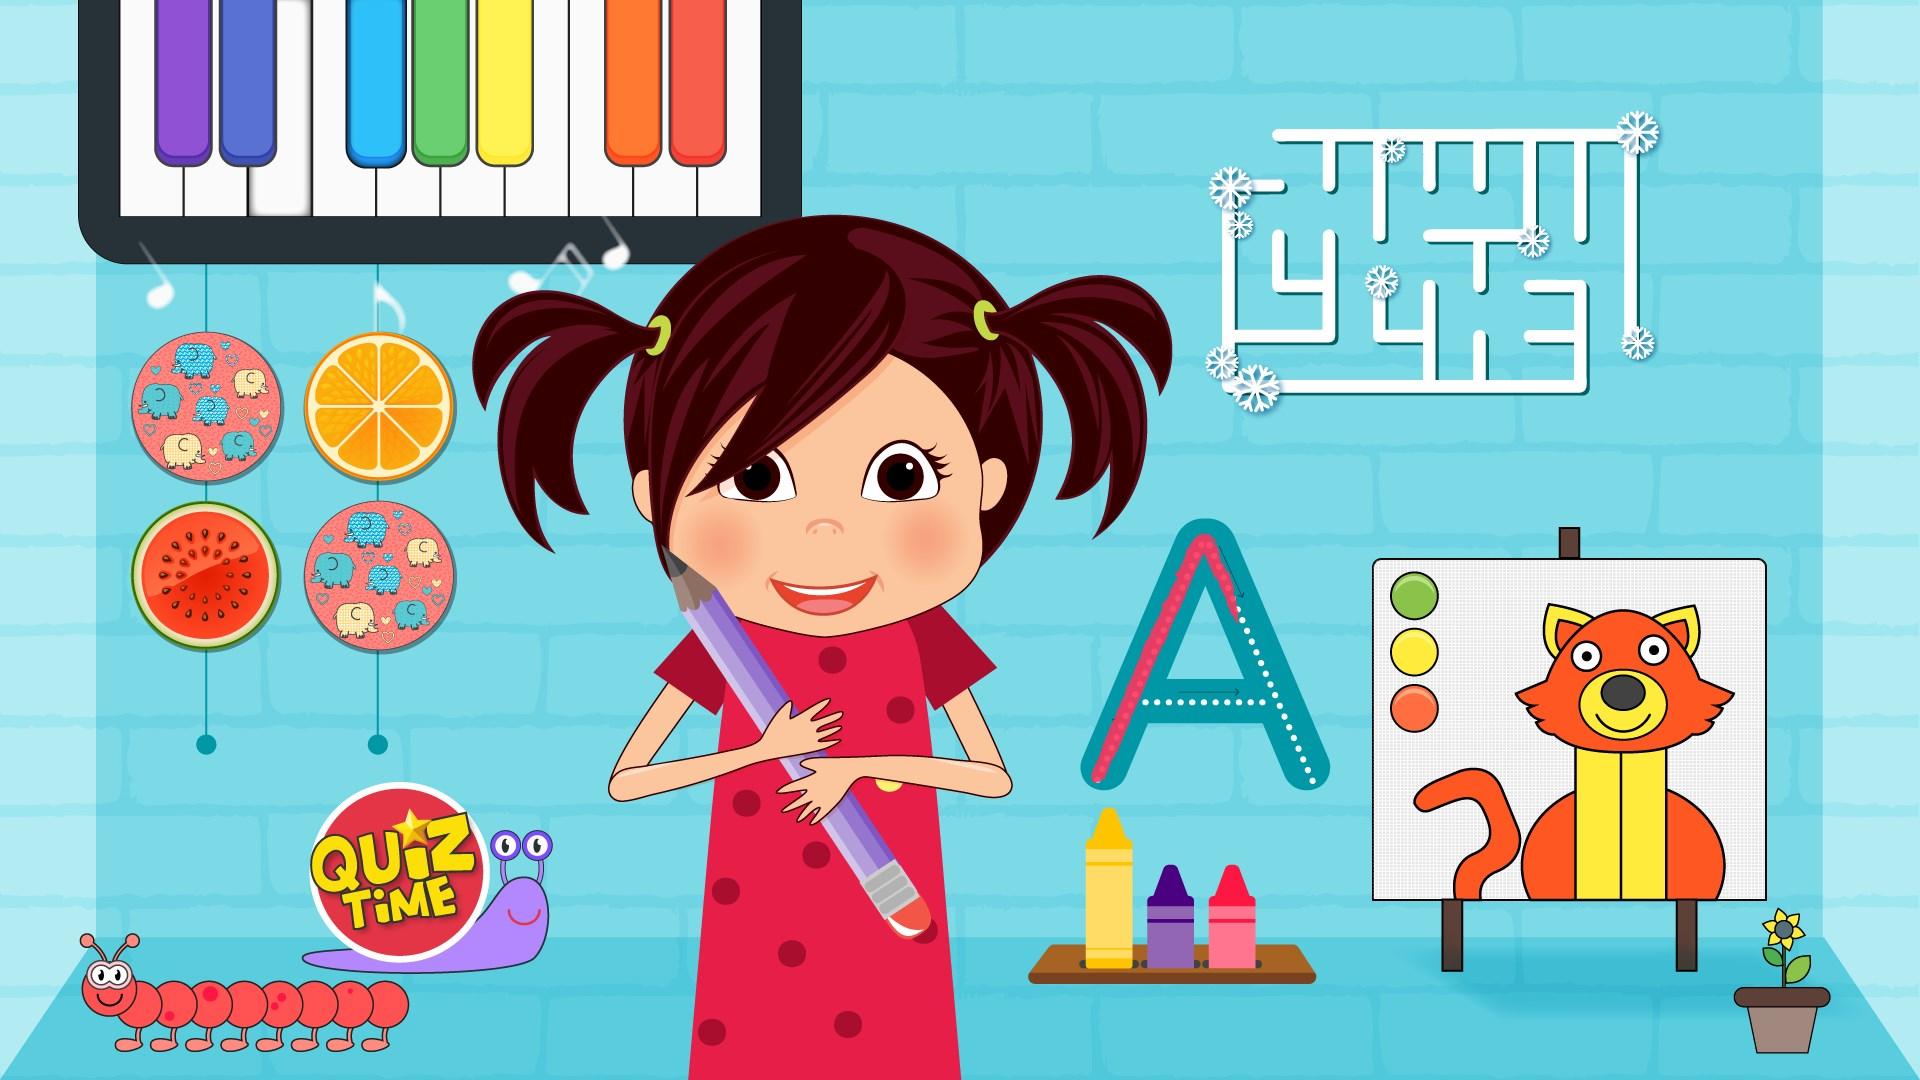 apps.38274.9007199266370181.aaa82efd d8a9 4f6c 870c 97a5015a9aa4 - Kindergarten Computer Games